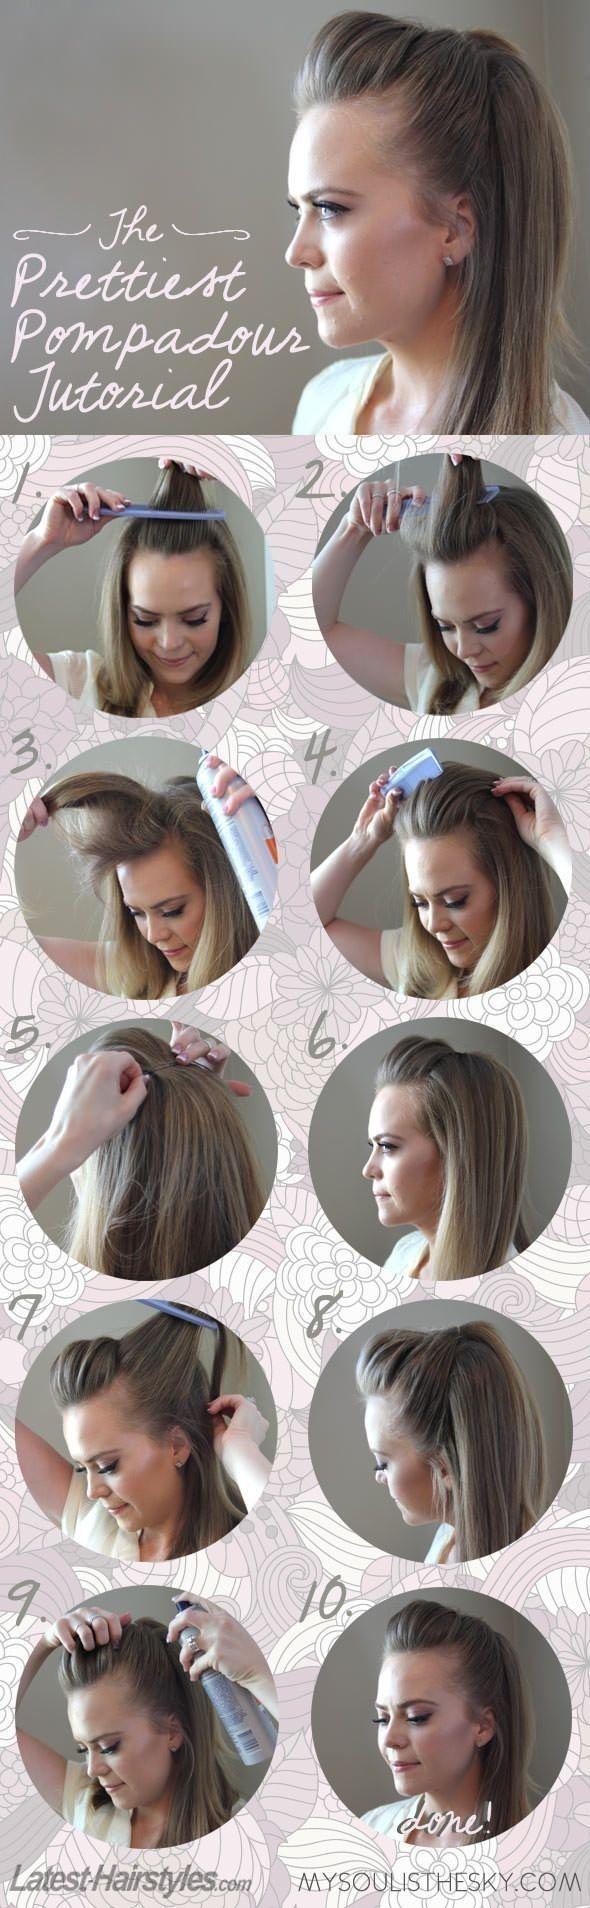 Stylish Pompadous Hairstyle Tutorial